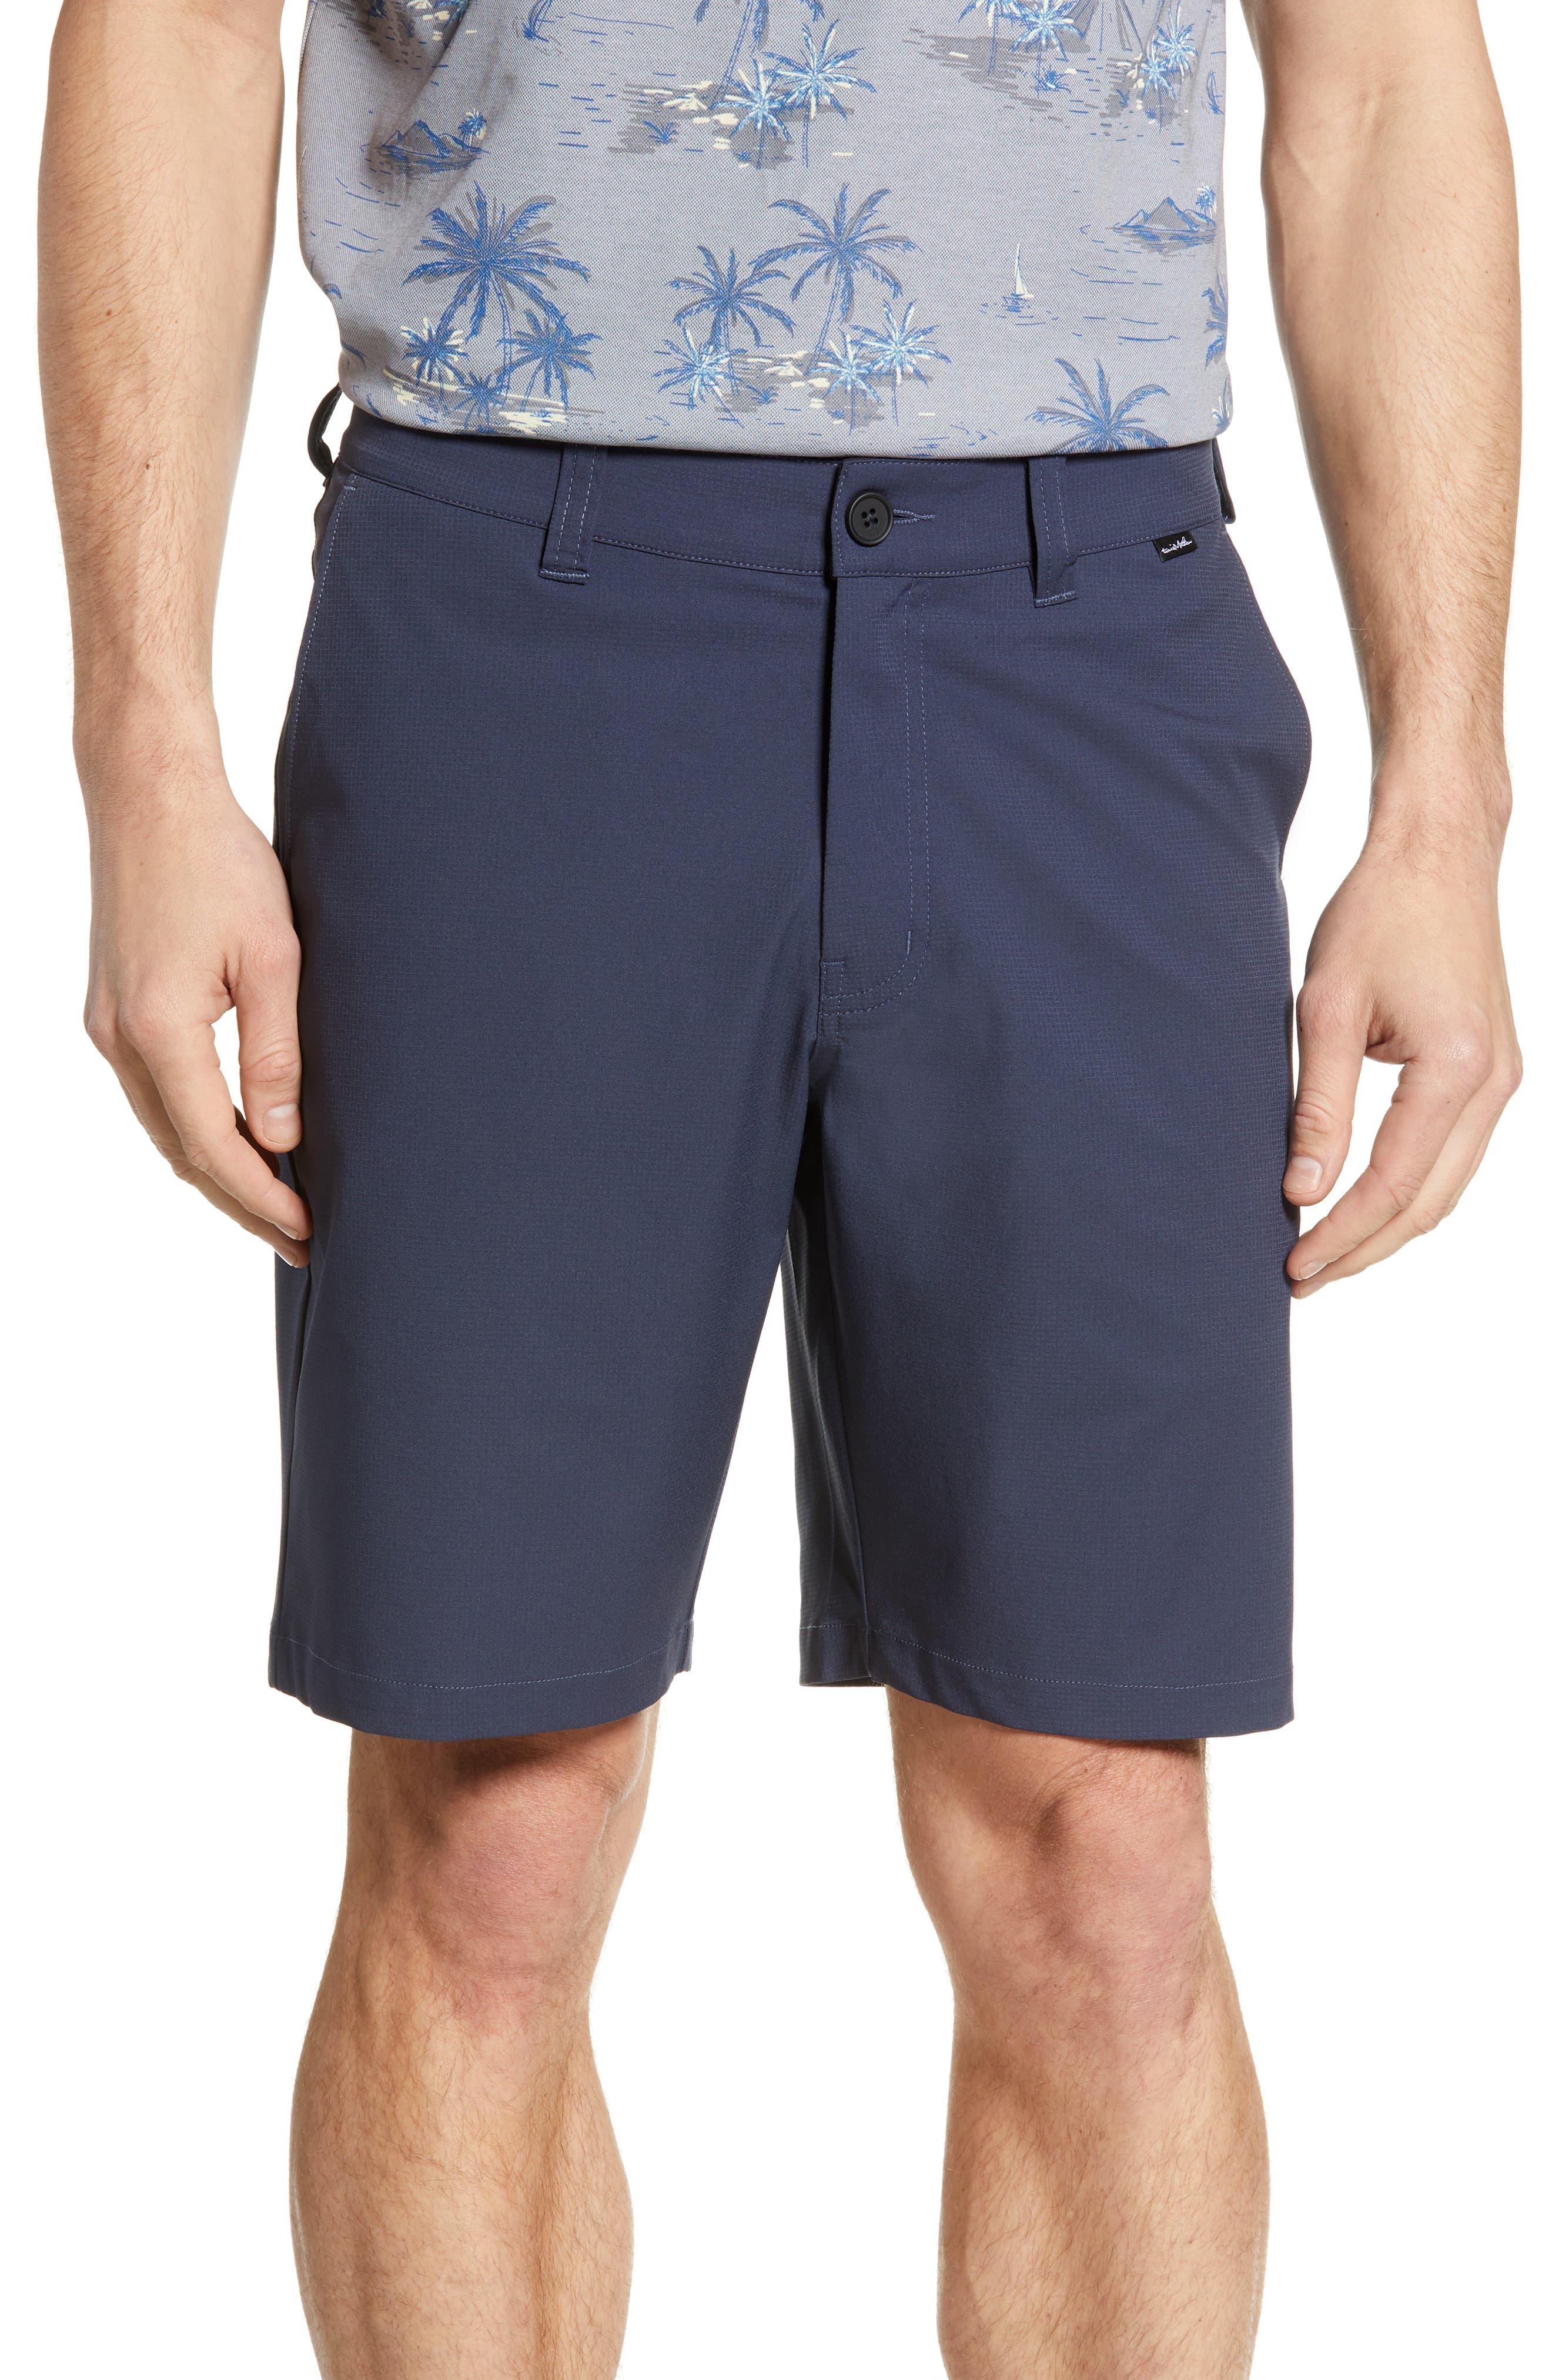 3e907017d5 Travismathew Starnes Stretch Performance Shorts, Blue